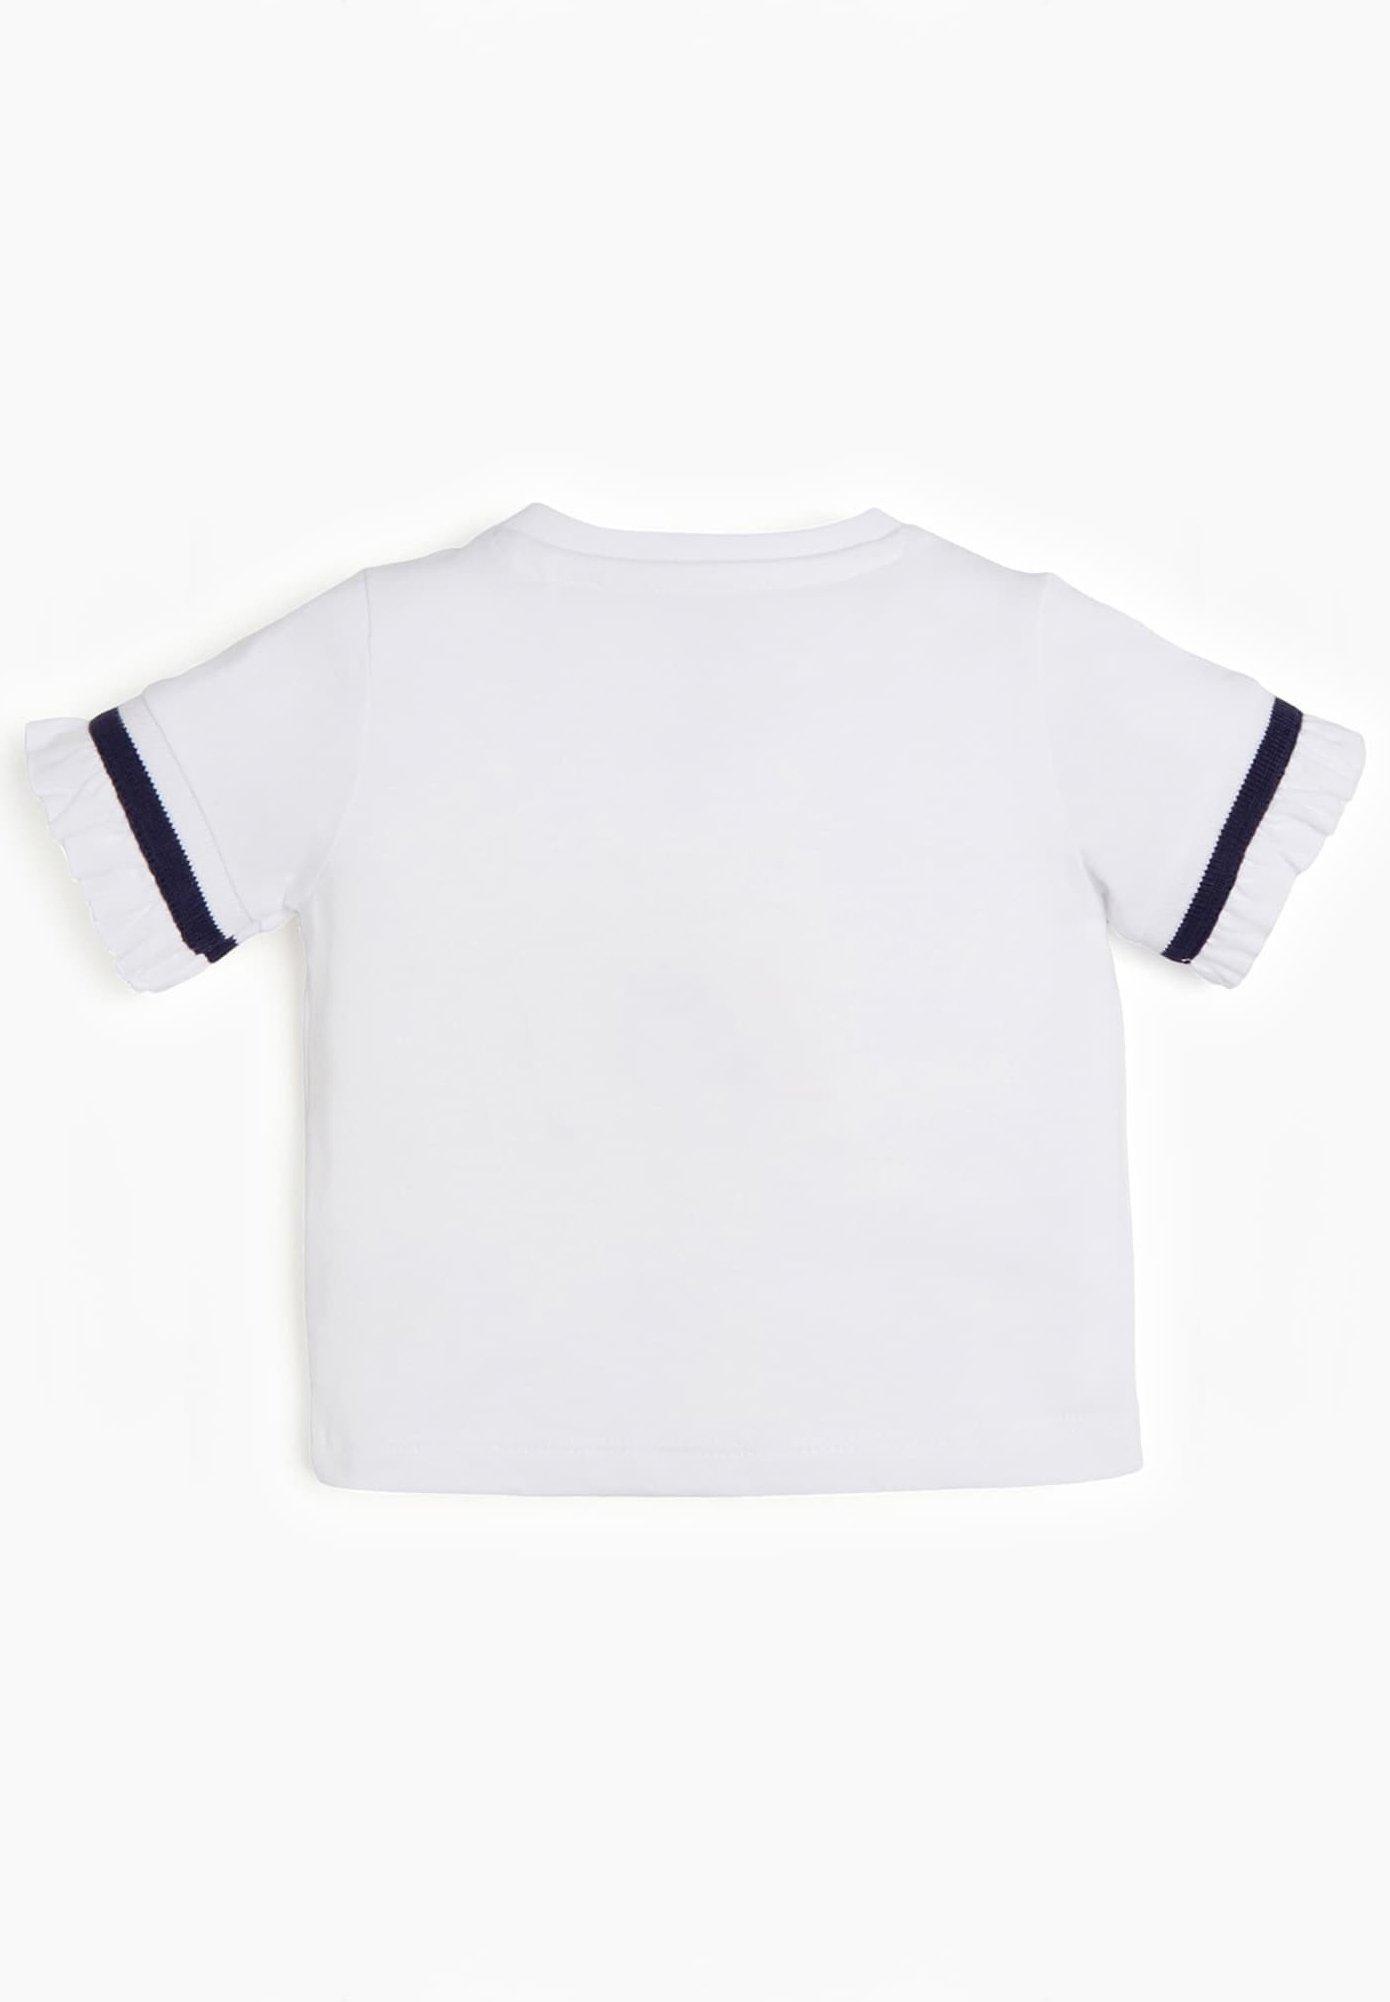 Guess Print T-shirt - Weiß